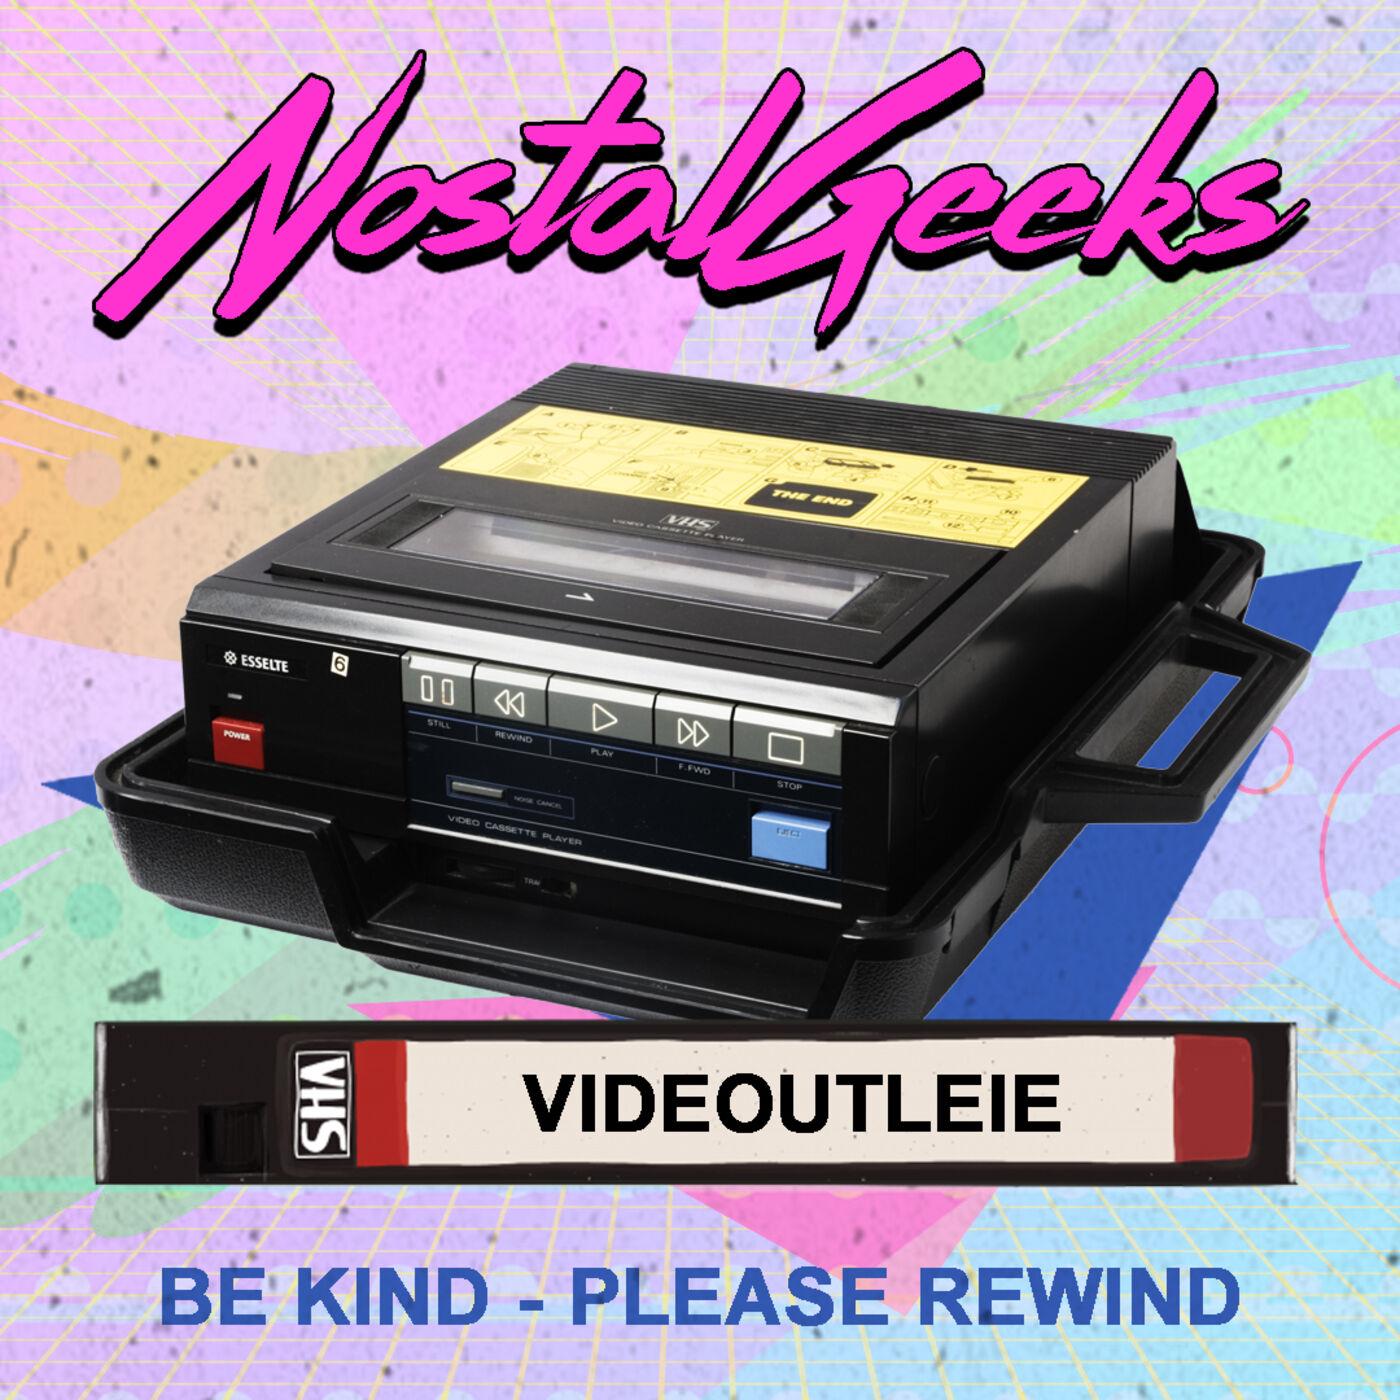 Videoutleie - Be Kind - Please Rewind